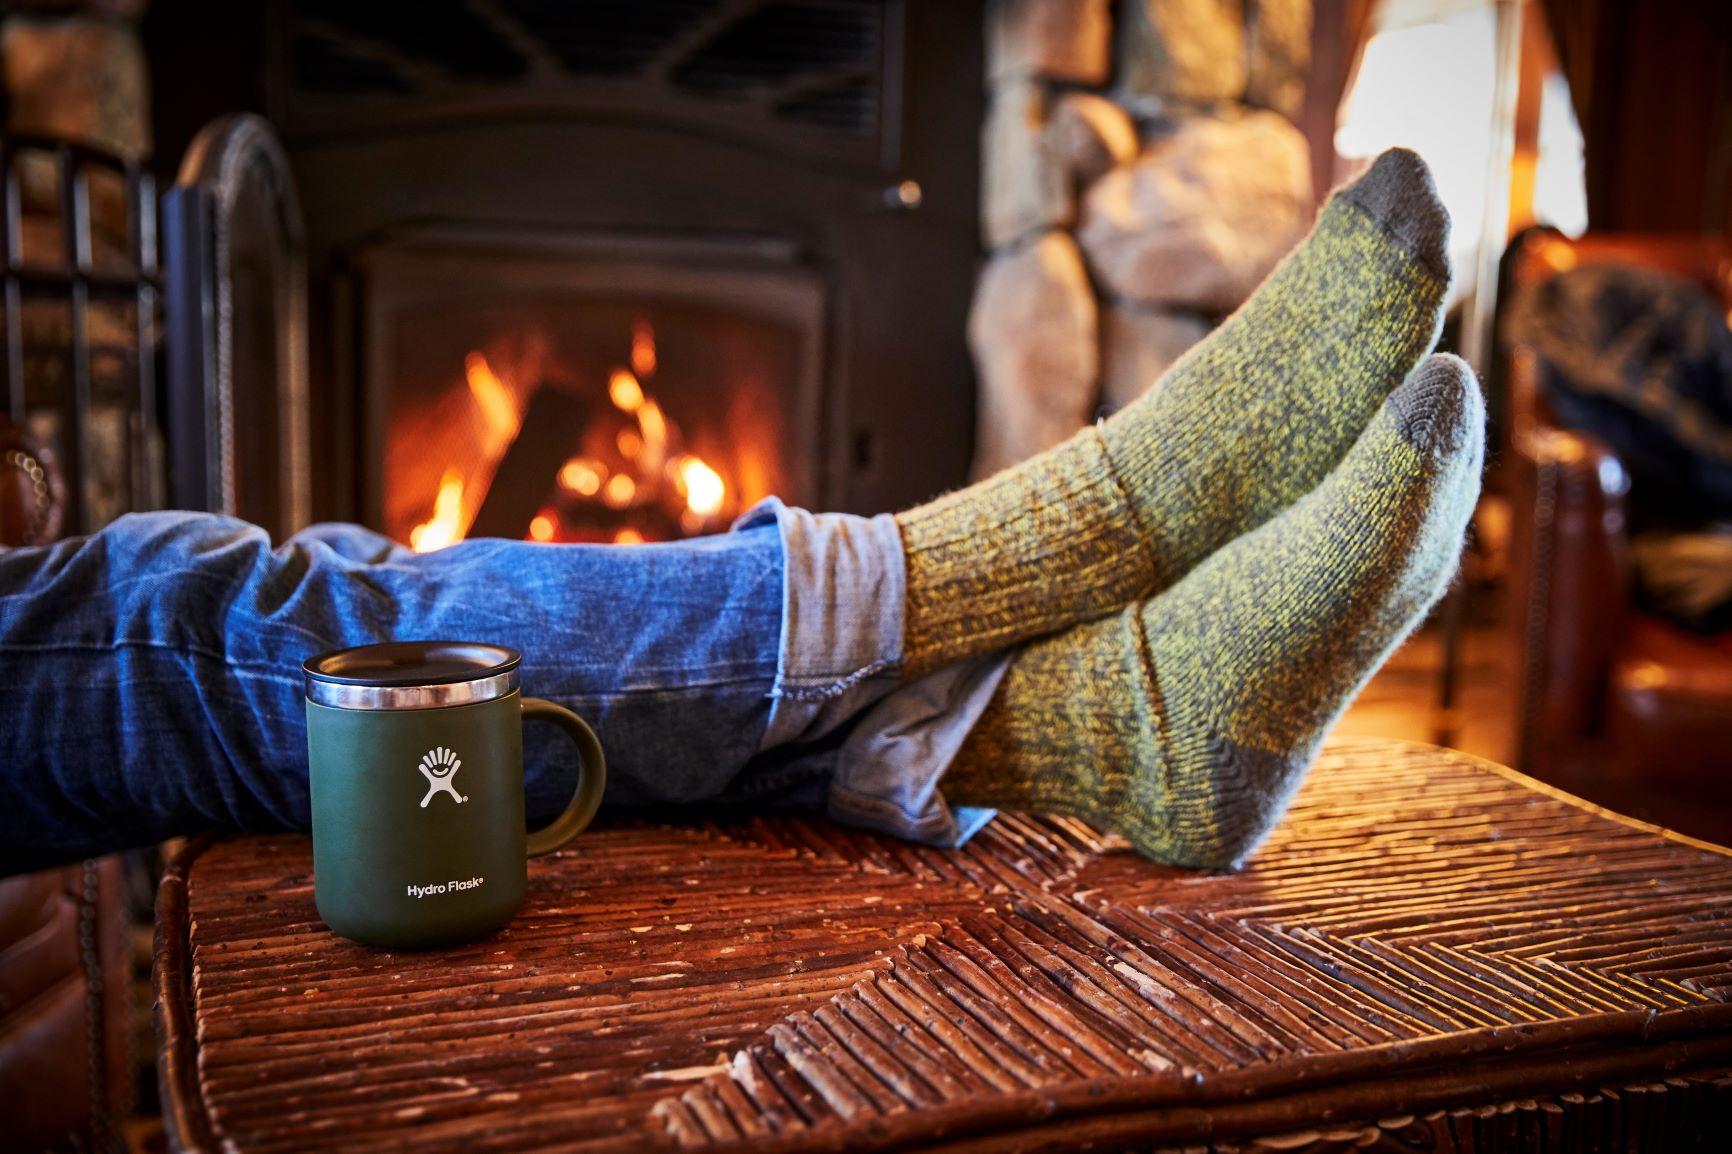 Hydro Flask Coffee Mug near fireplace